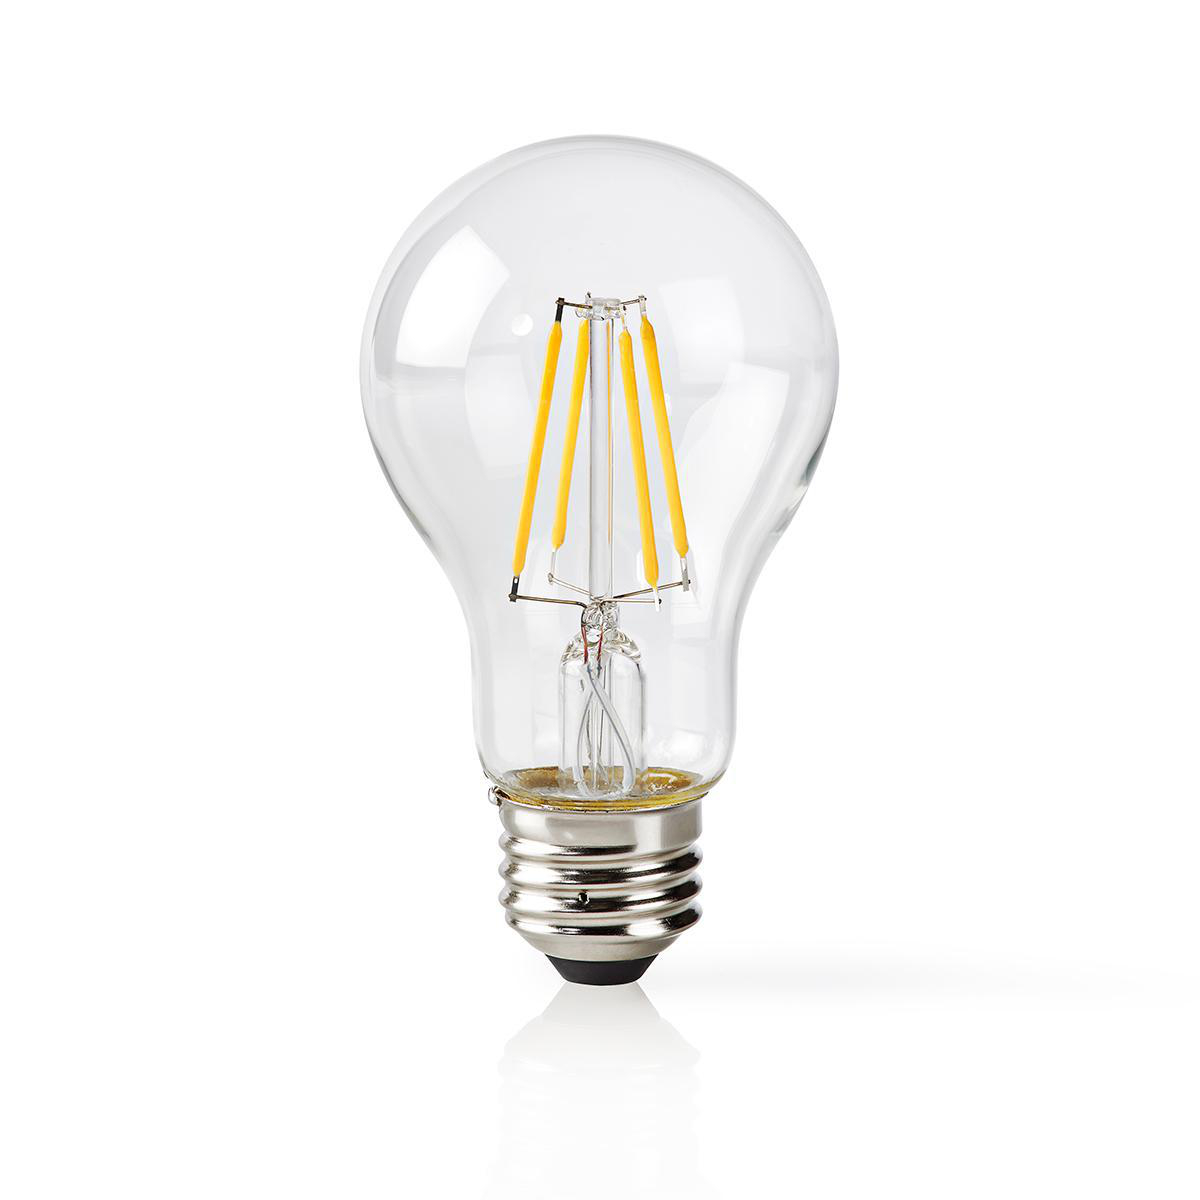 Slimme Wi-Fi Led Lamp helder glas 5 Watt 2700K warm wit - vooraanzicht lamp uit